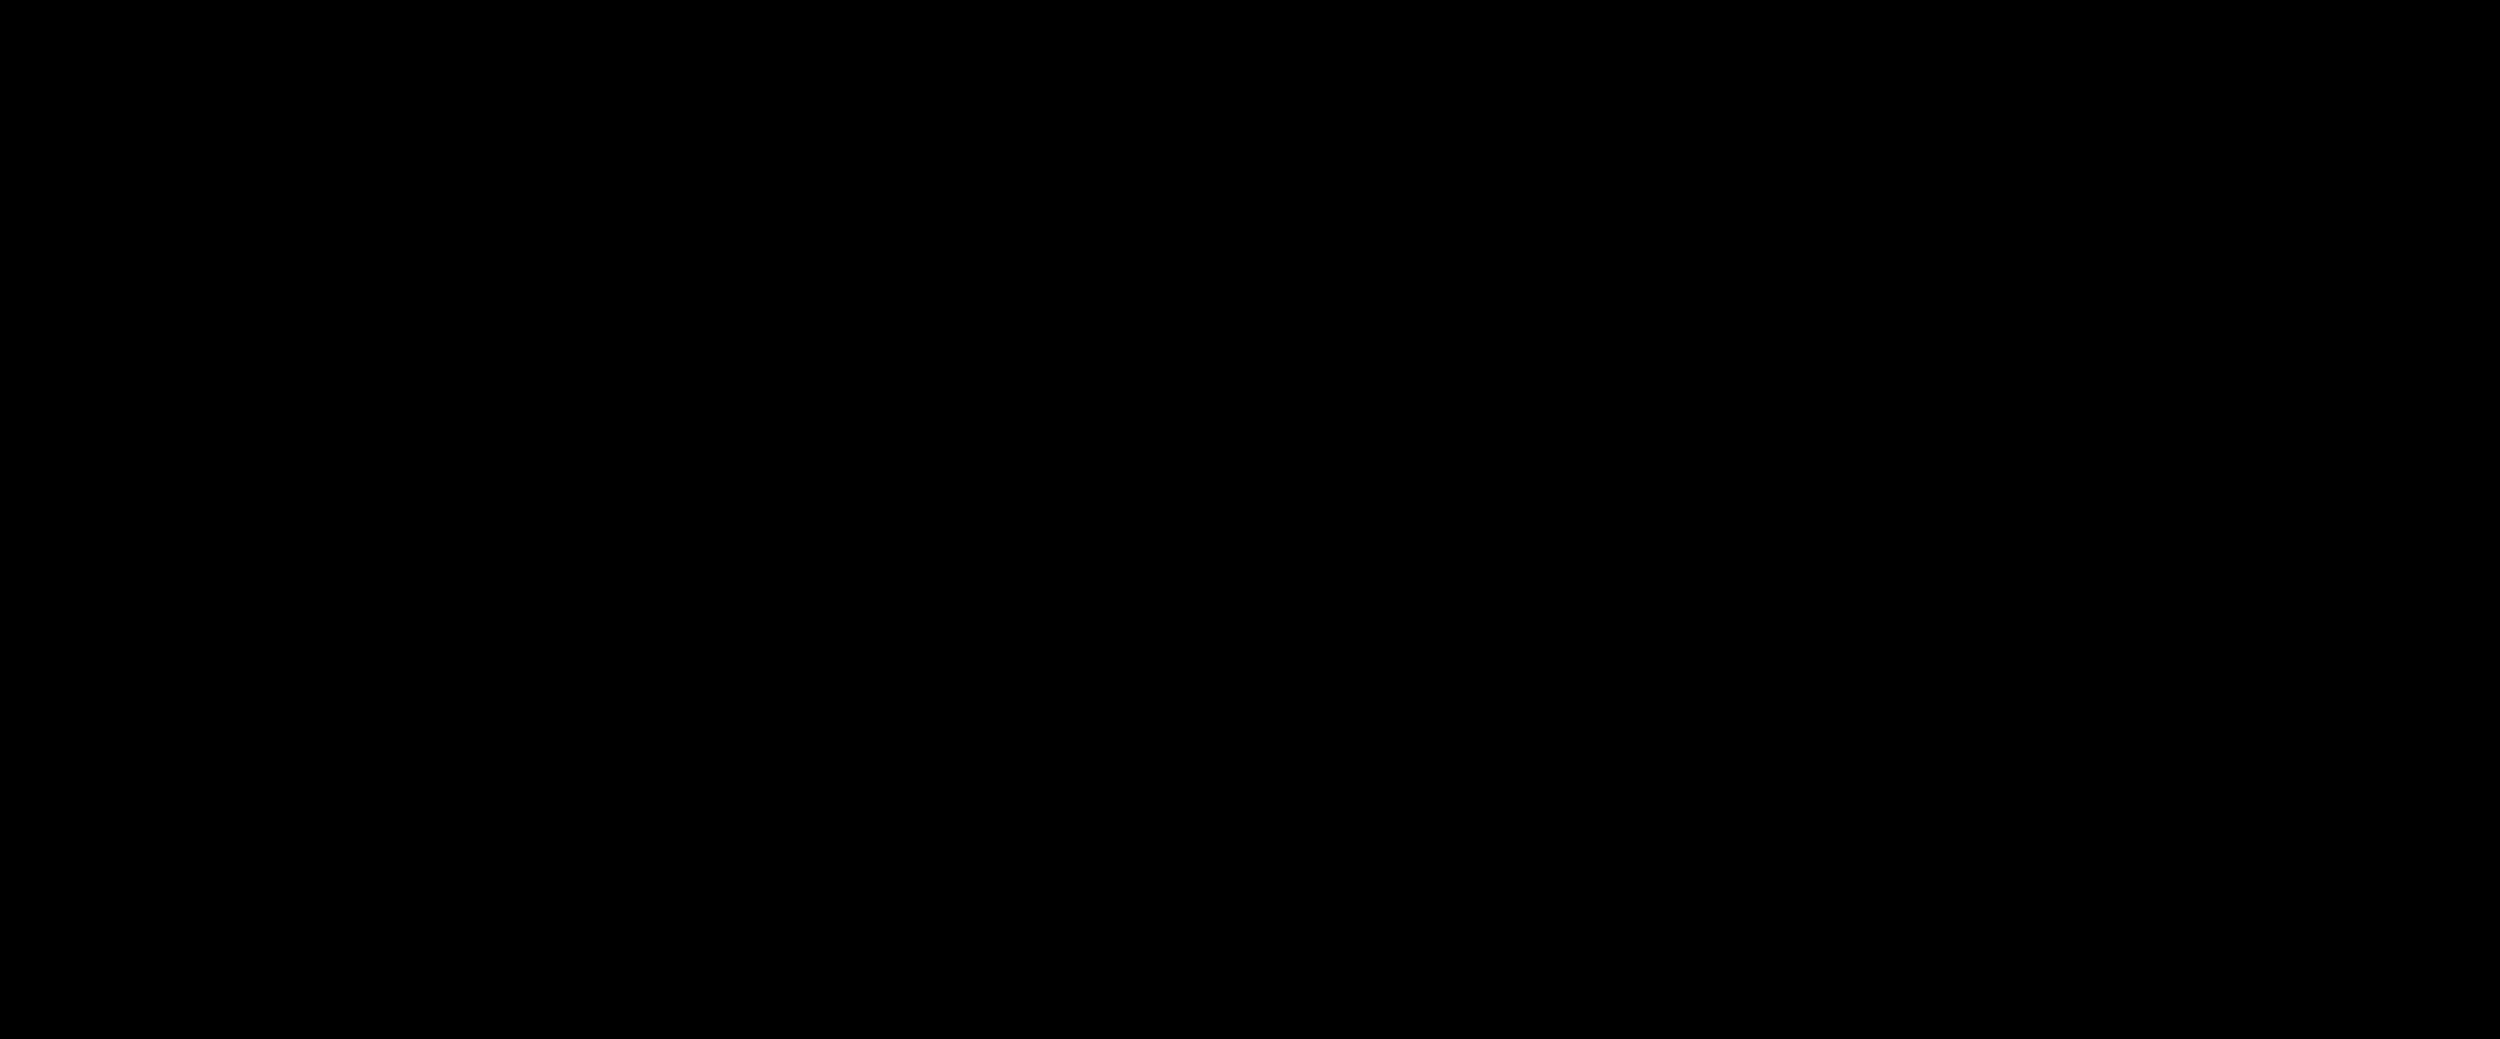 Waterfall_Audio_Logo_Noir_Transparent_HD.png